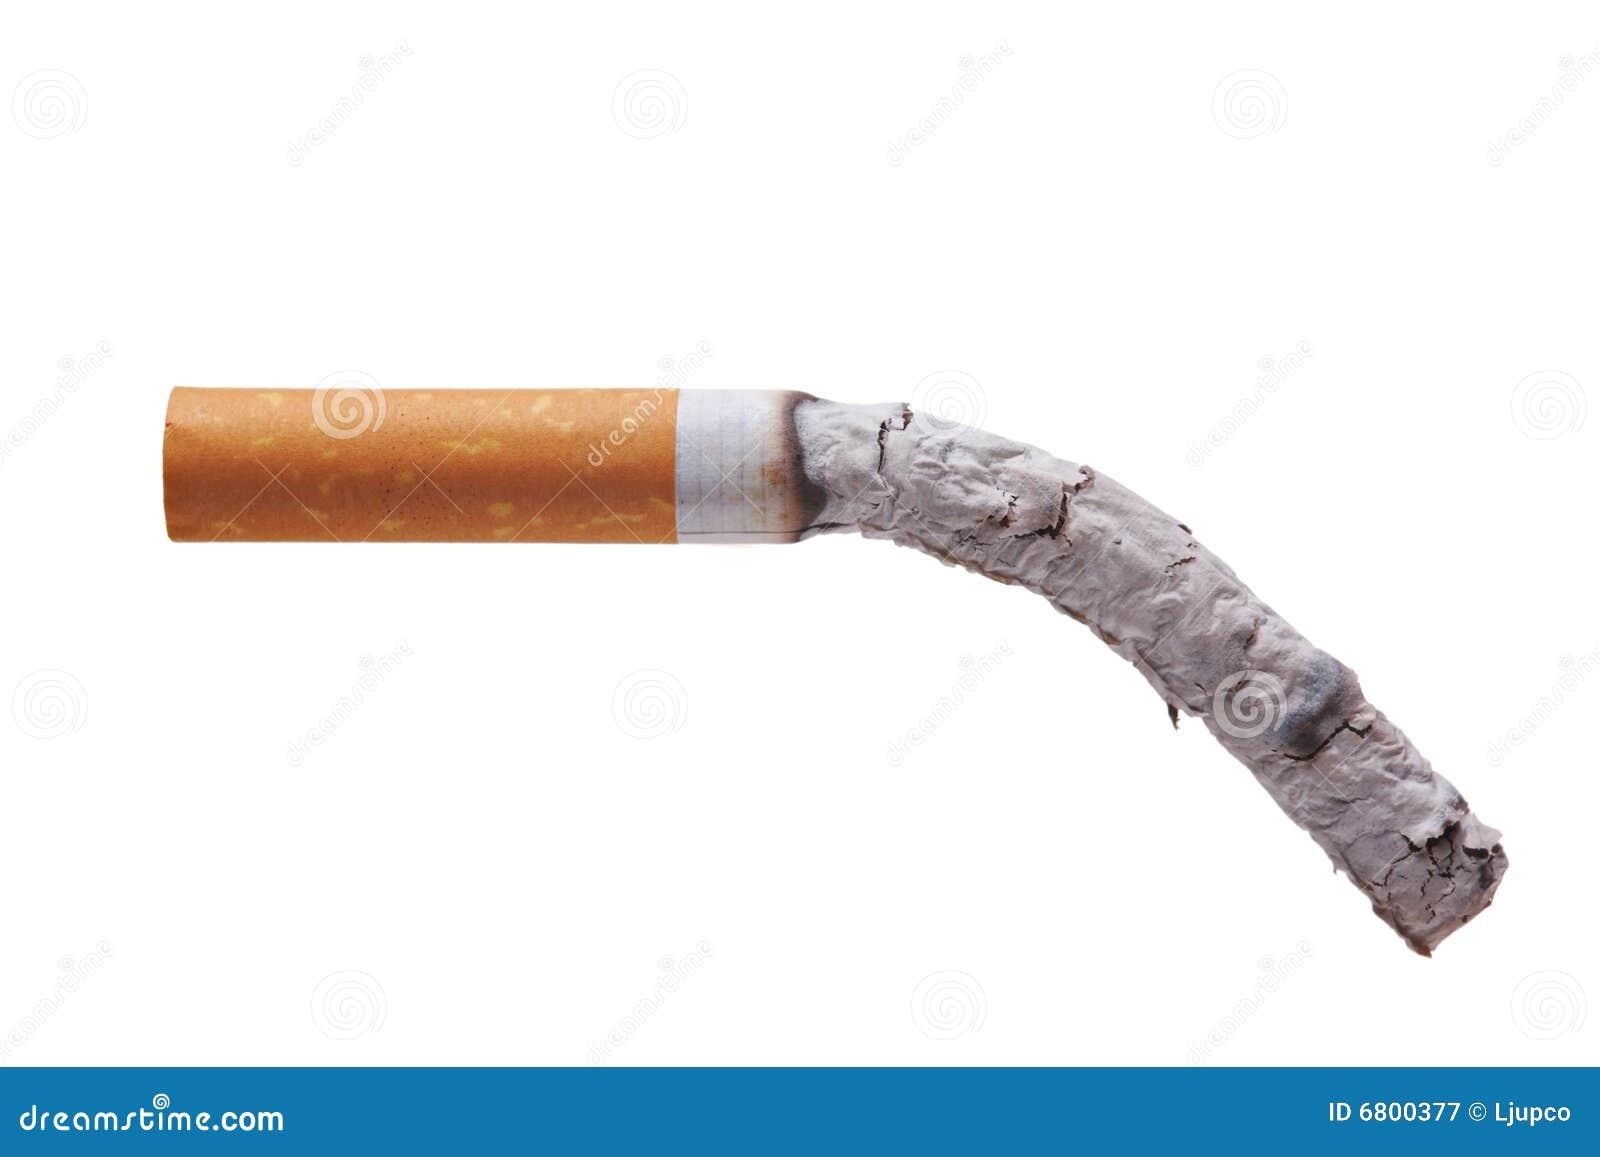 brennende zigarette lizenzfreie stockfotografie bild 6800377. Black Bedroom Furniture Sets. Home Design Ideas